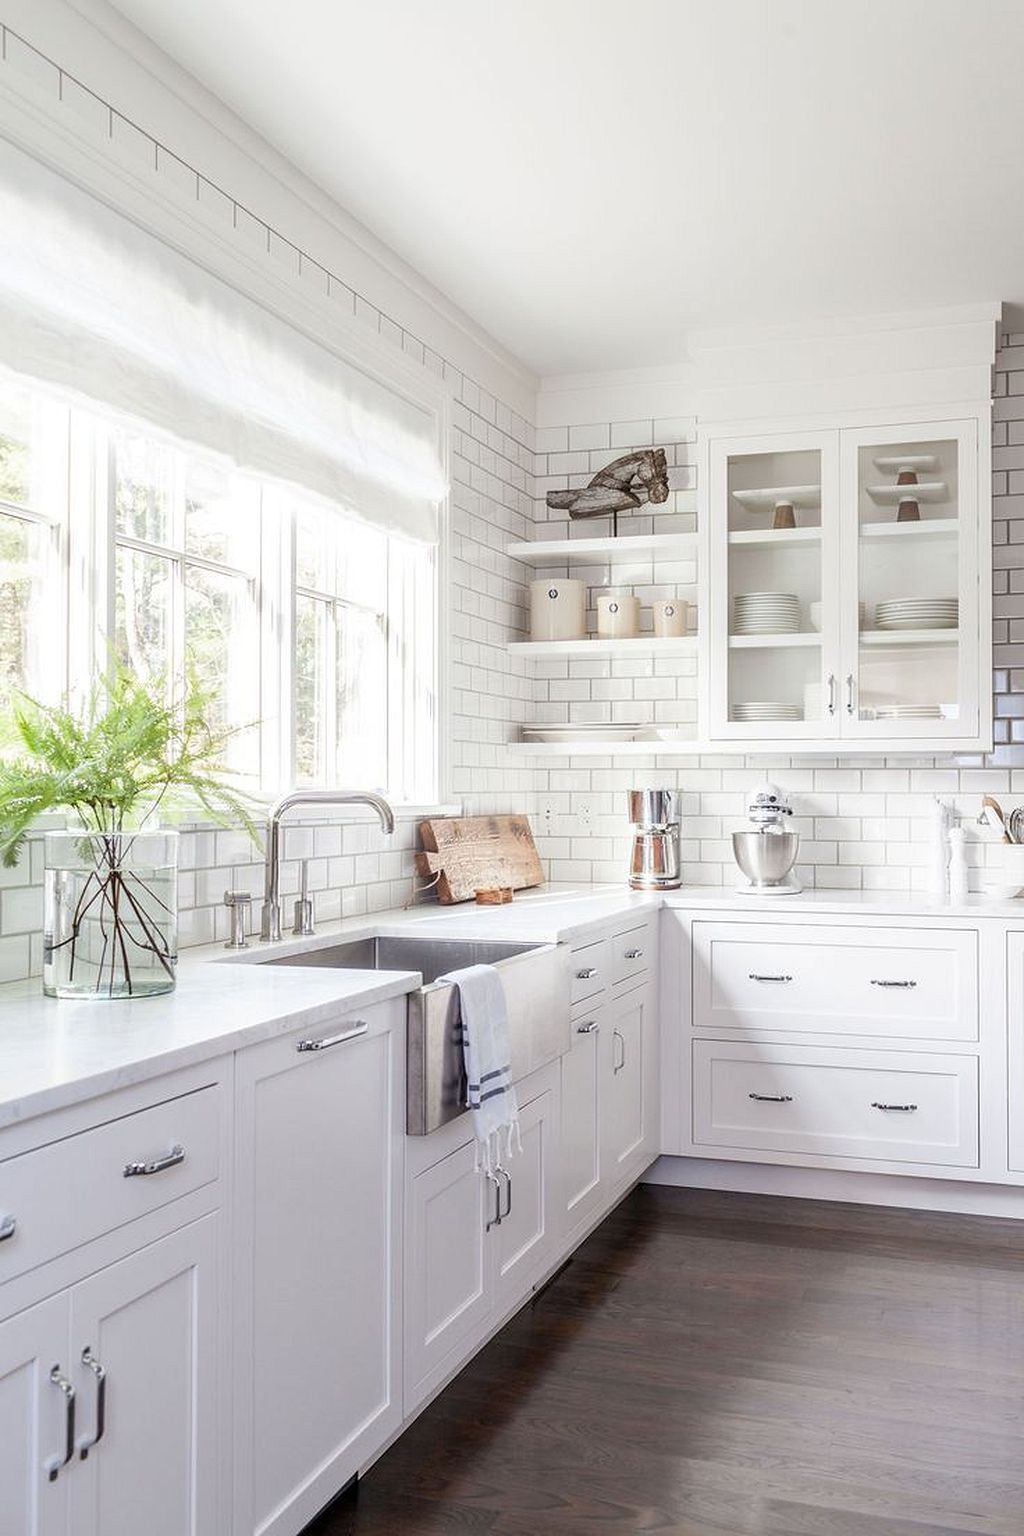 Modern kitchen window design   incredible white kitchen design ideas  kitchen design kitchens